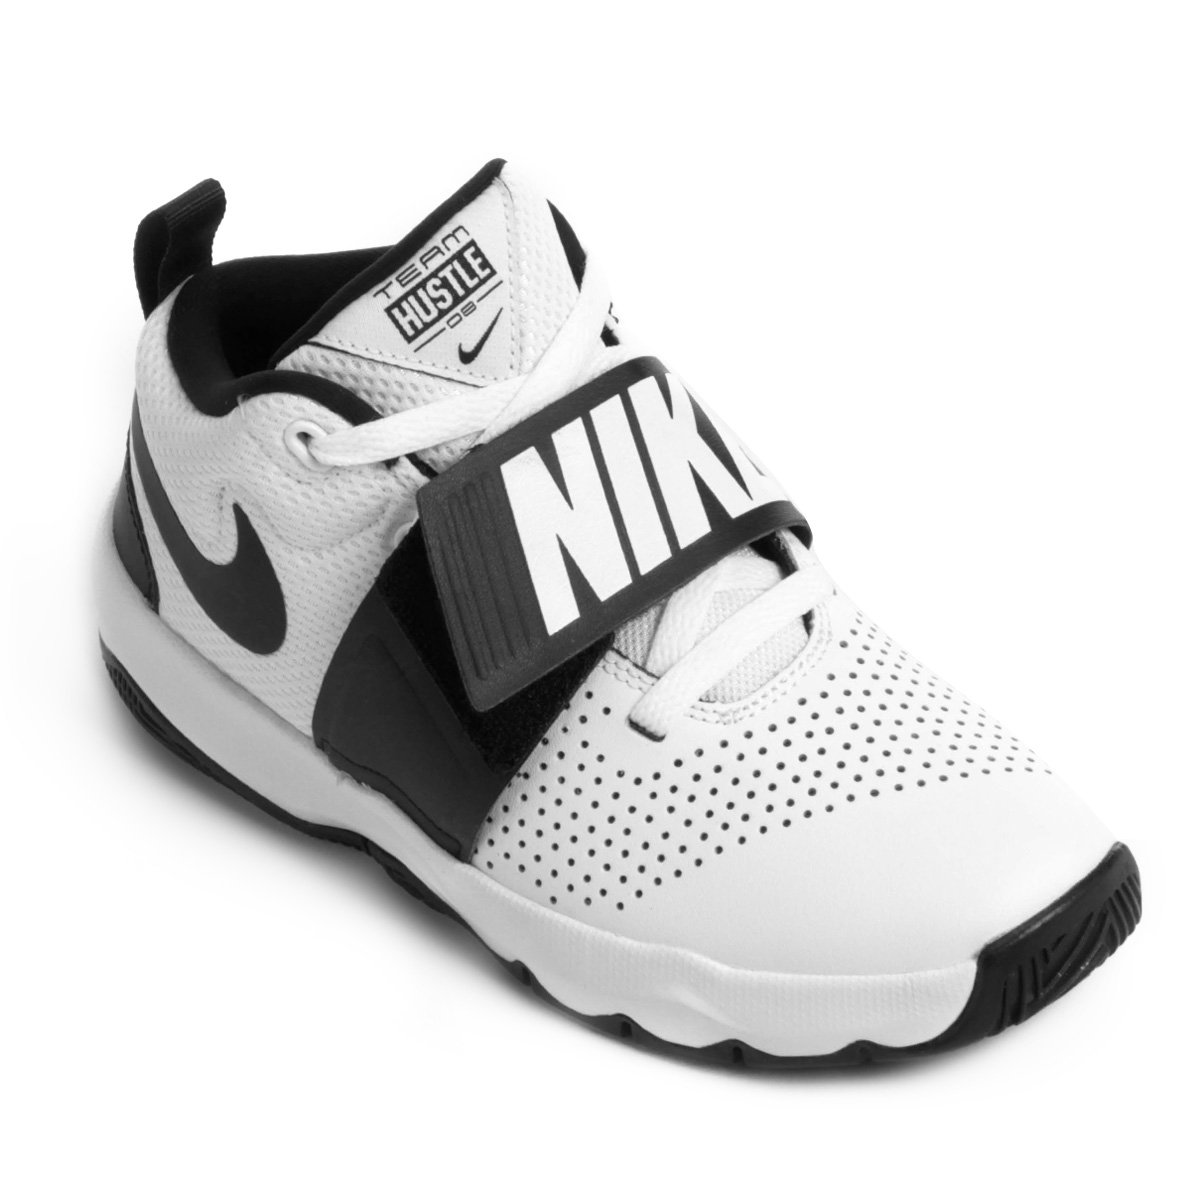 Tênis Infantil Nike Team Hustle D8 Masculino Branco e Preto